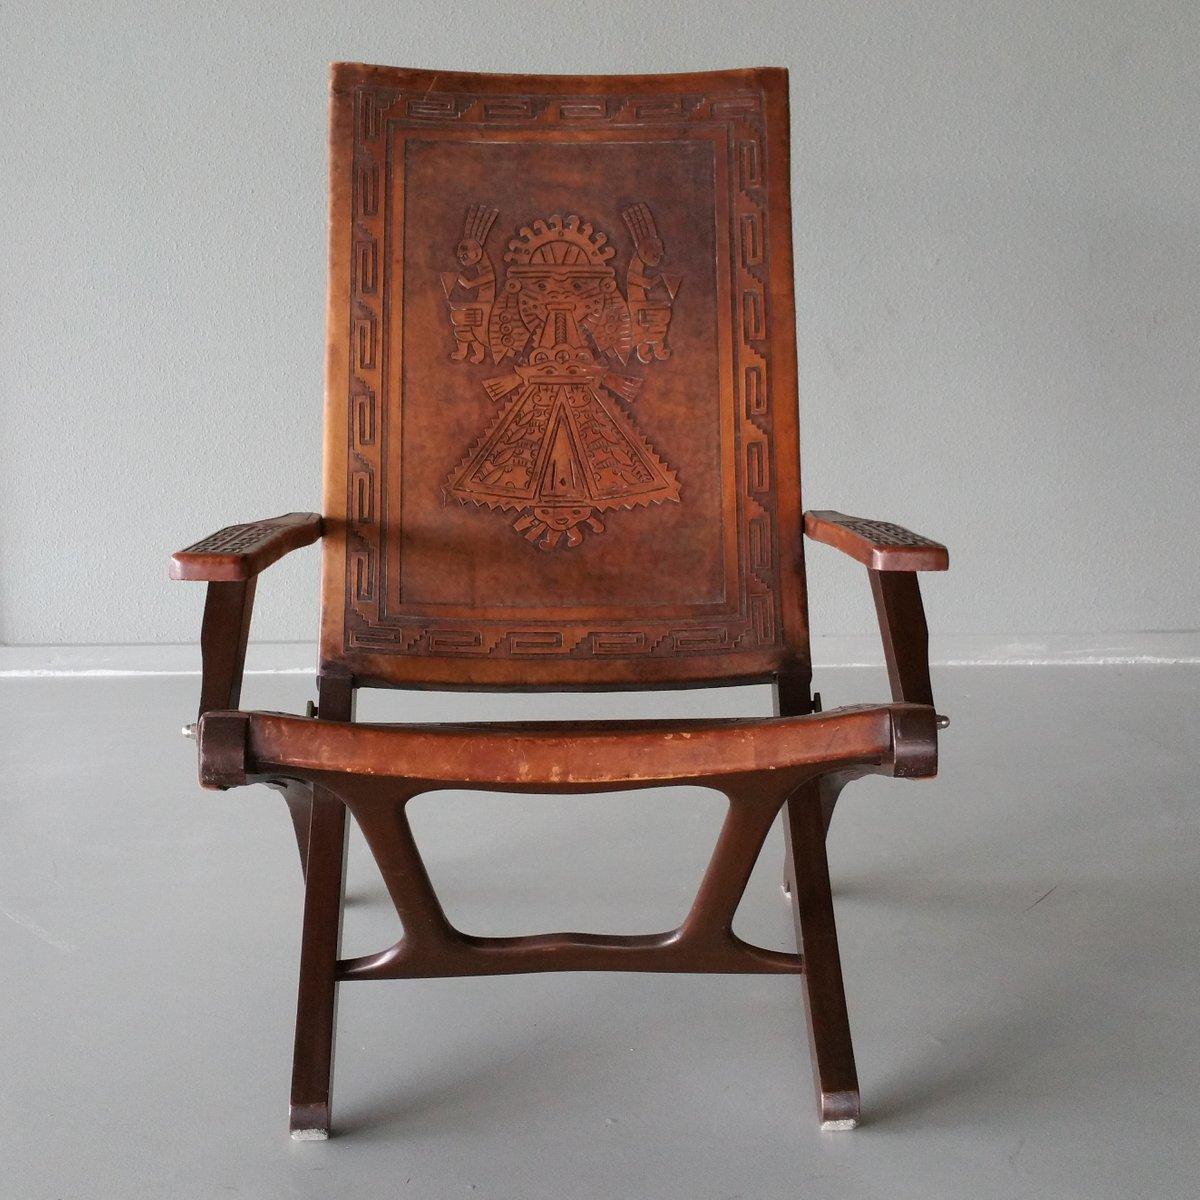 Leather Wood Folding Chair By Angel Pazmino For Muebles De Estilo 1960s